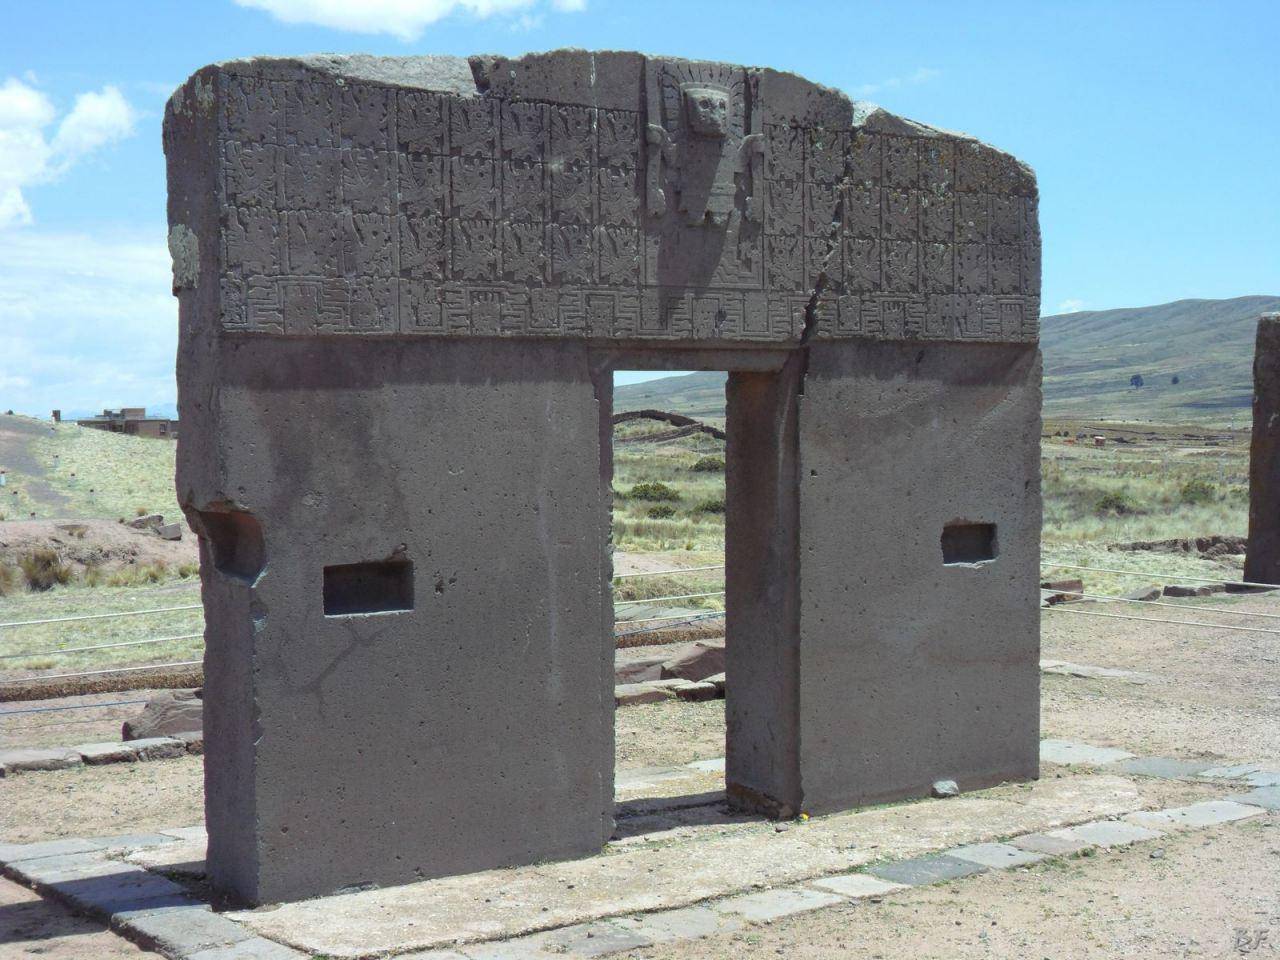 Sito-Megalitico-Piramide-Akapana-Kalasasaya-Menhir-Tiahuanaco-Bolivia-25